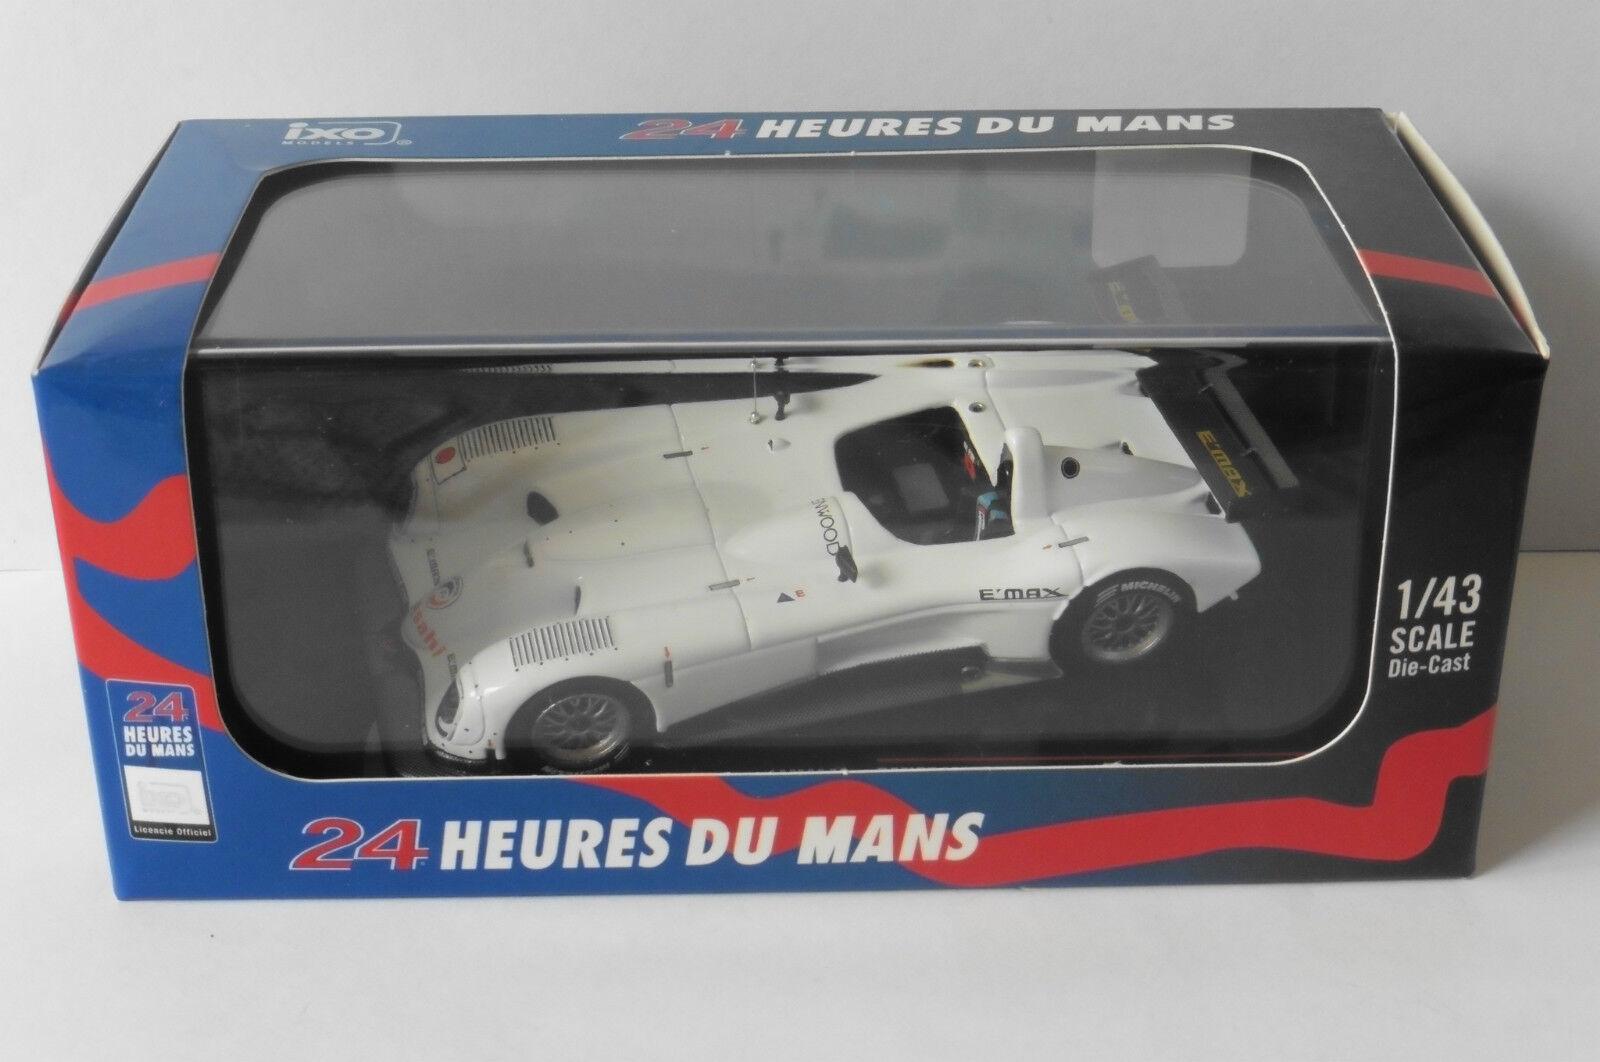 PANOZ LMP900 TEST CAR 24 HEURES DU MANS 2000 IXO LMM140 1 43 HOURS blanc blanc